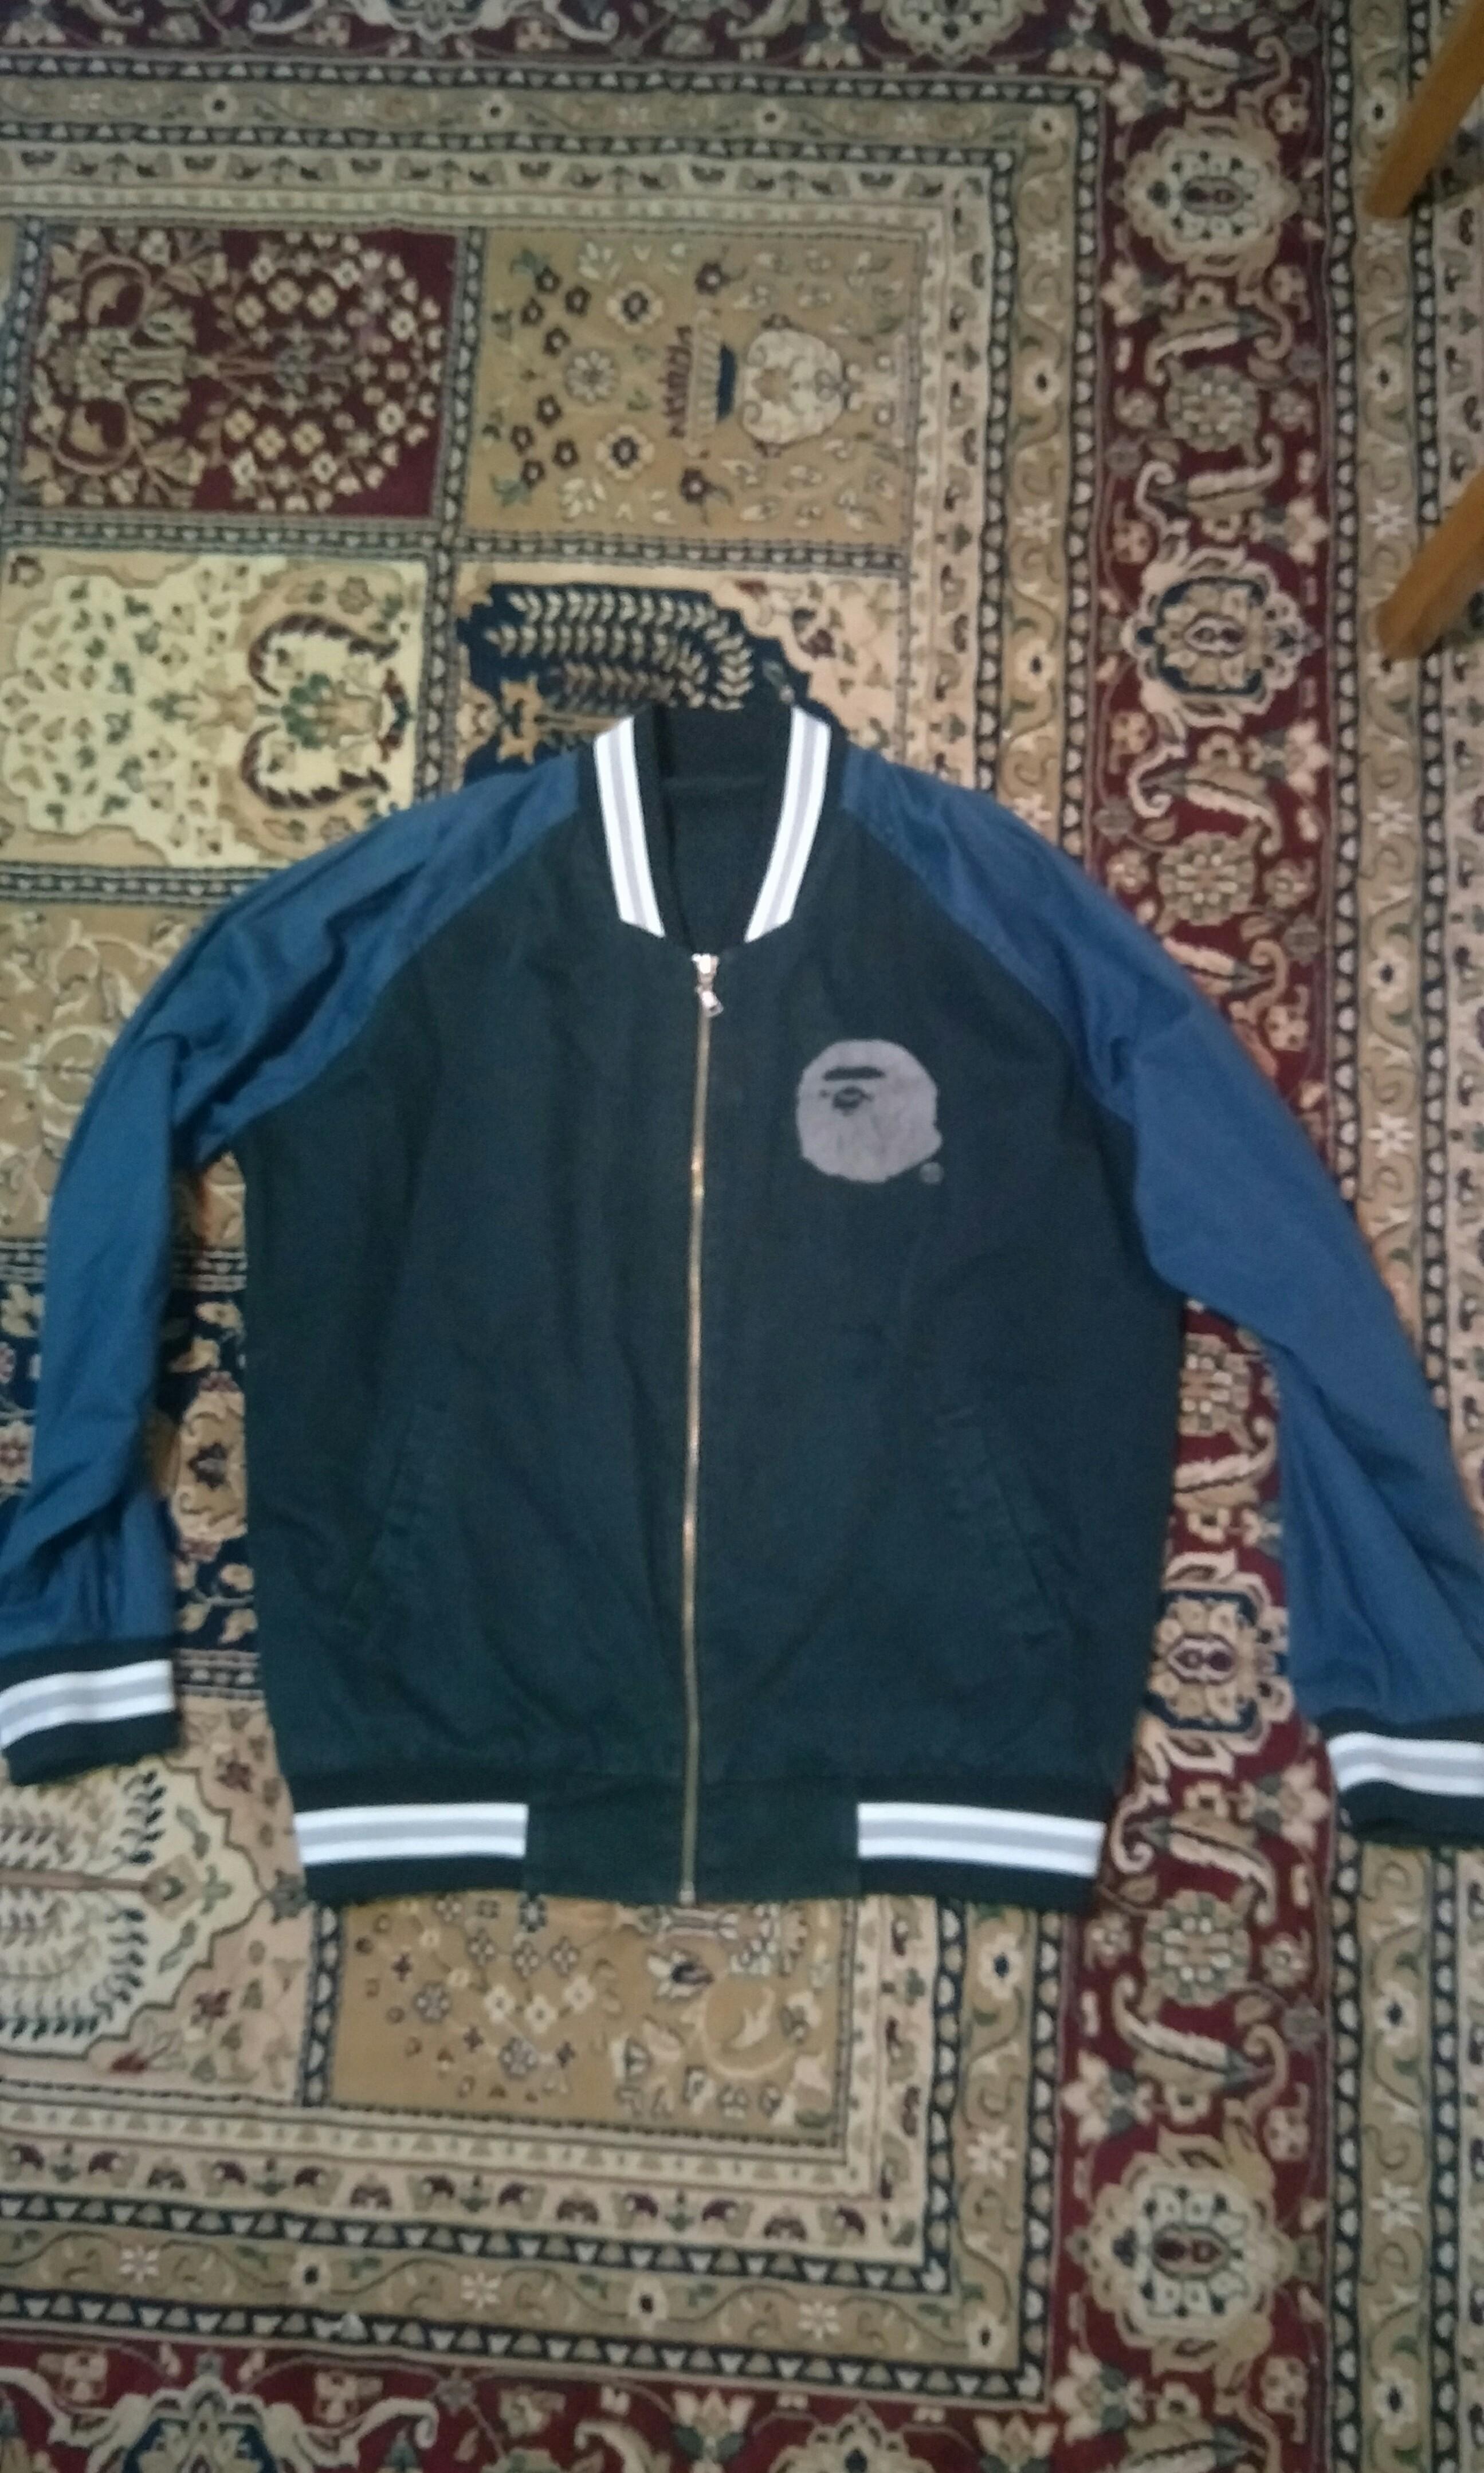 509f9c3bbe65 Bape varcity jacket anno 2001